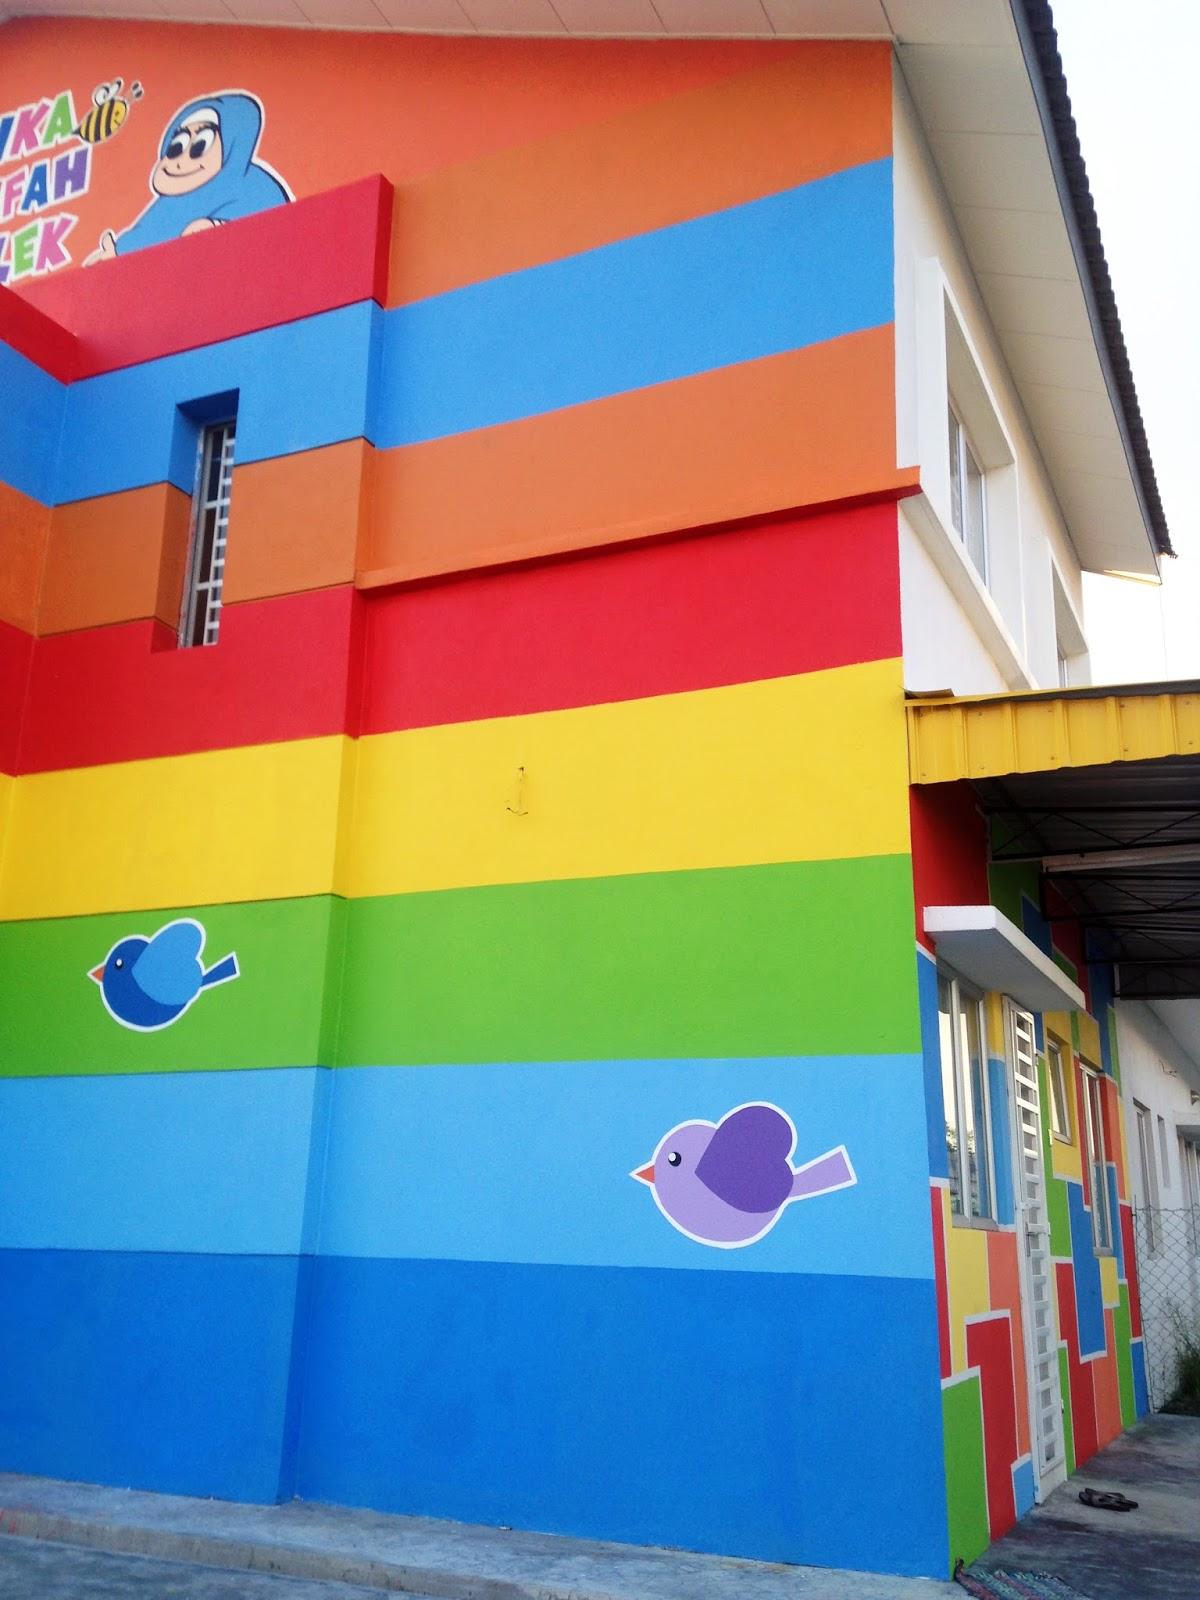 Warna arts mural tadika khalifah intelek for Mural untuk taska